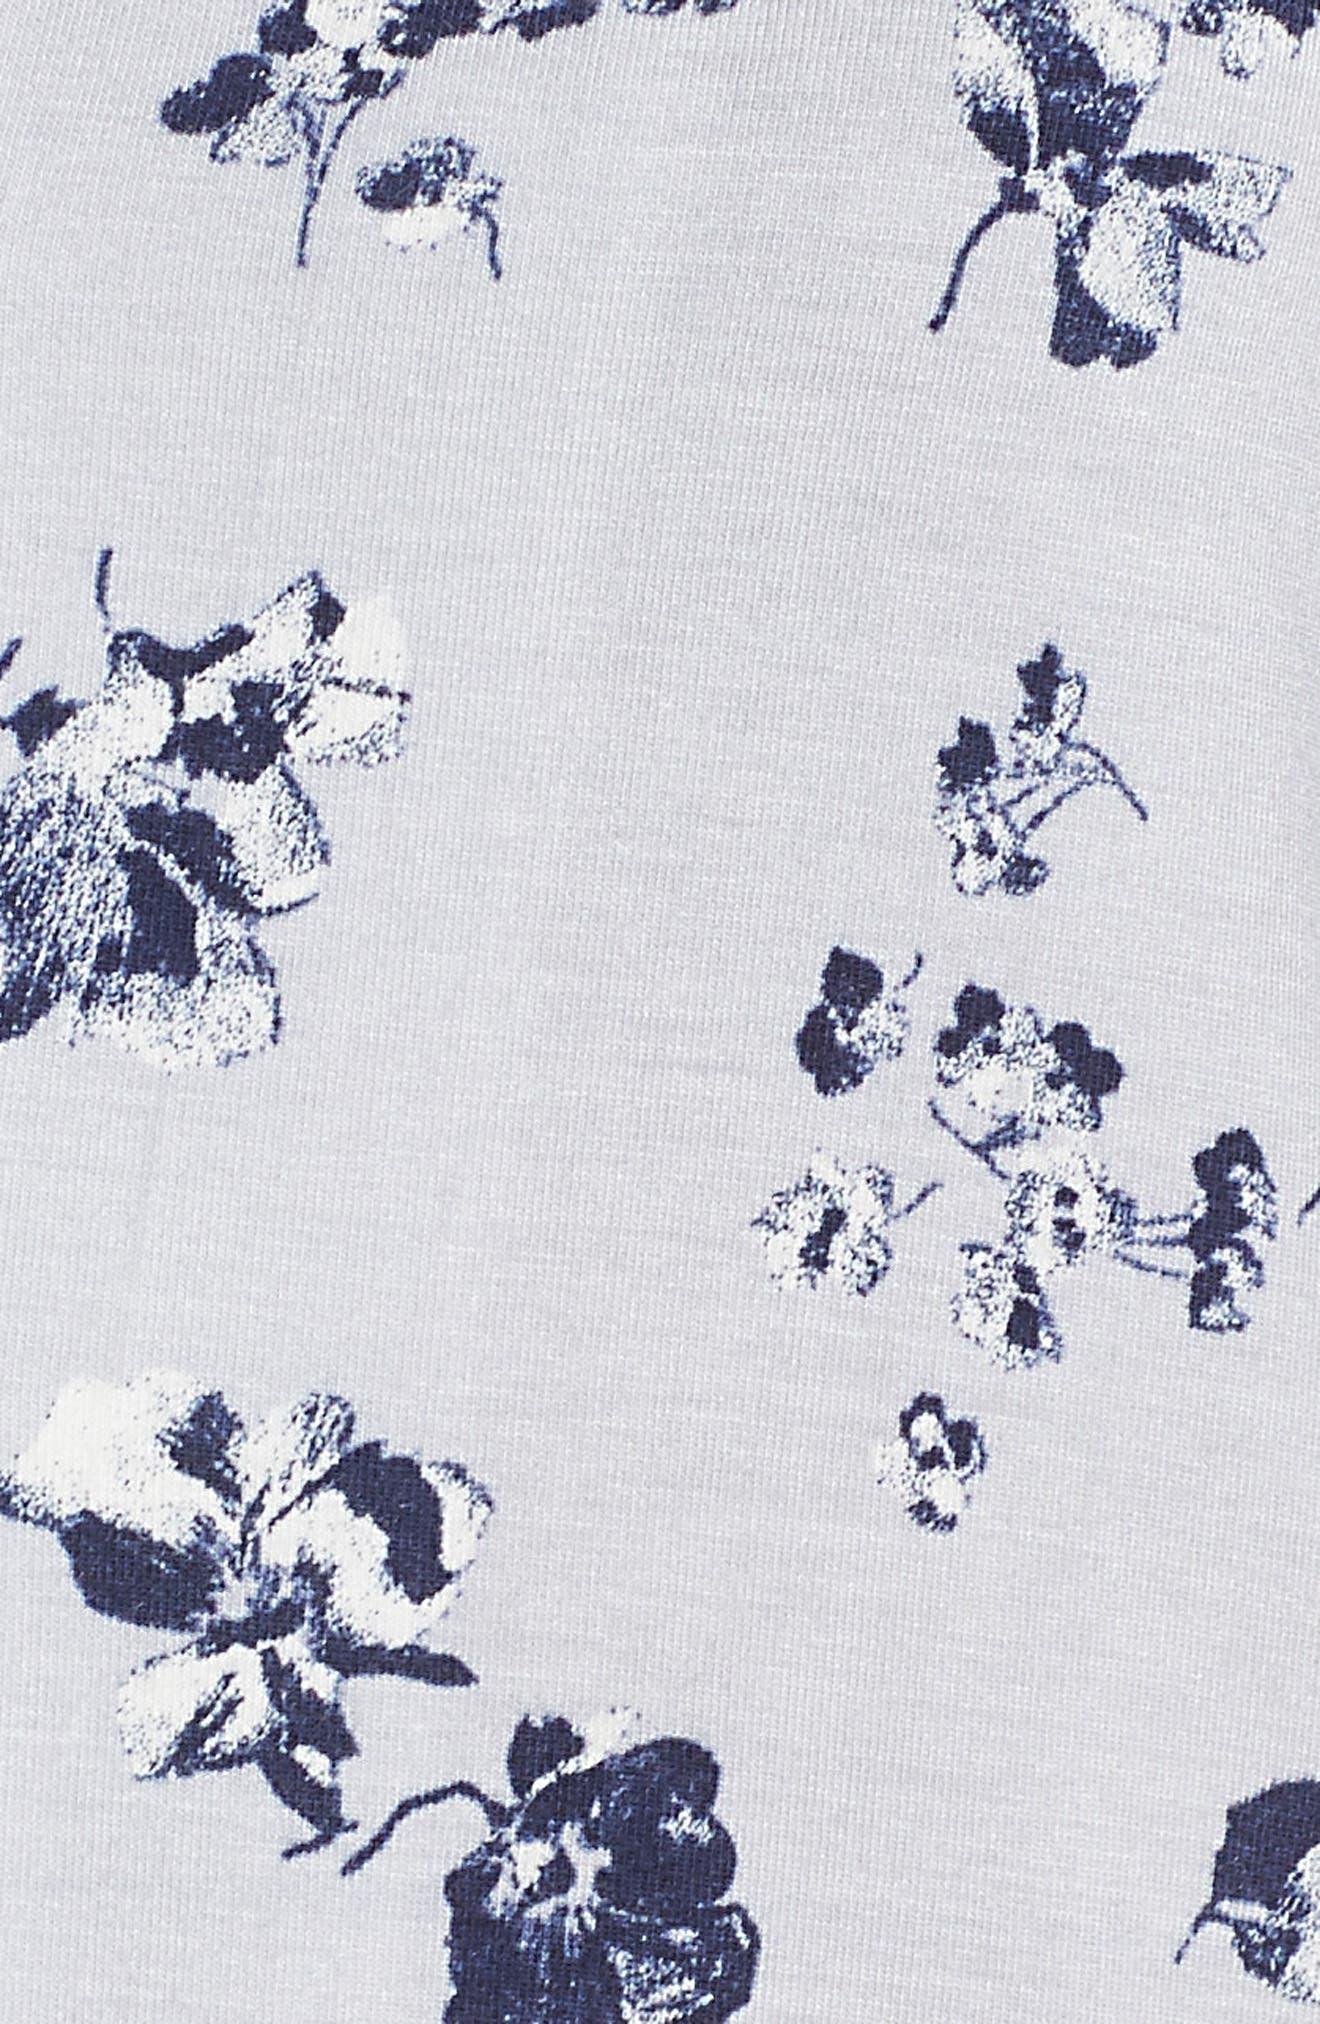 NORDSTROM LINGERIE, Moonlight Short Pajamas, Alternate thumbnail 5, color, GREY MICRO BLOOM